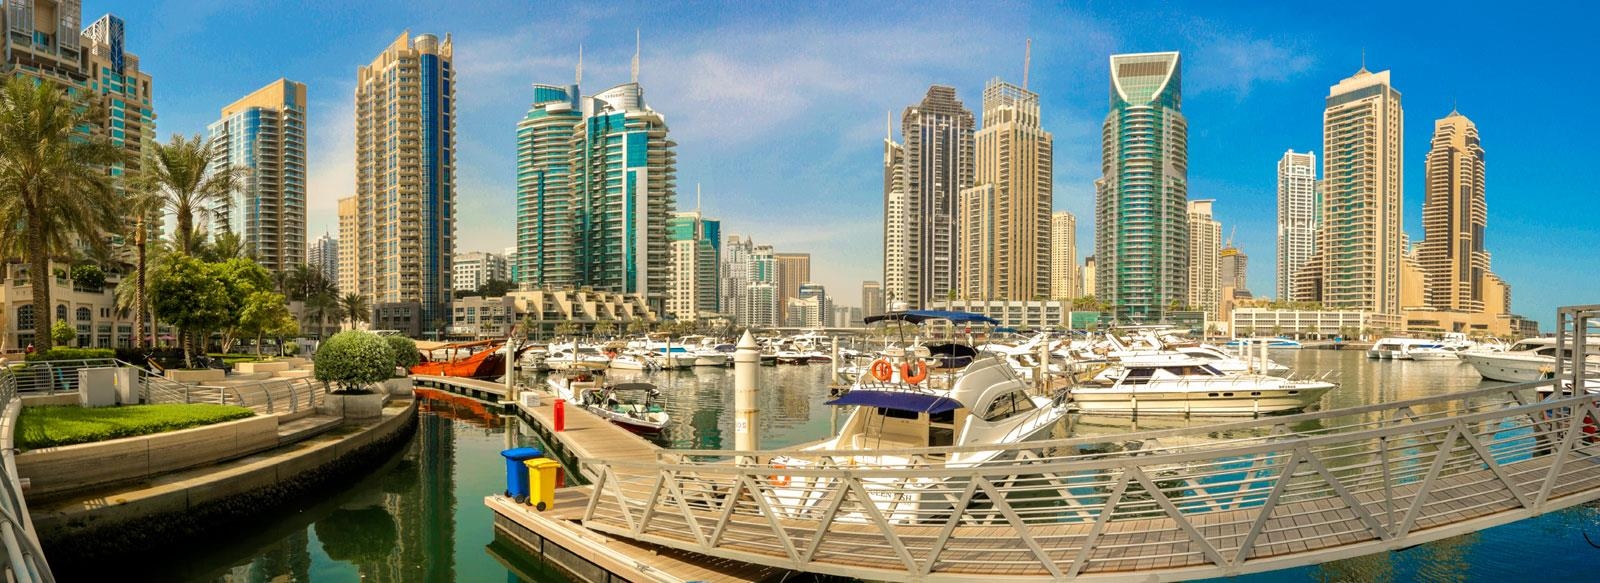 Al Habtoor Tower at Marina Walk, Dubai